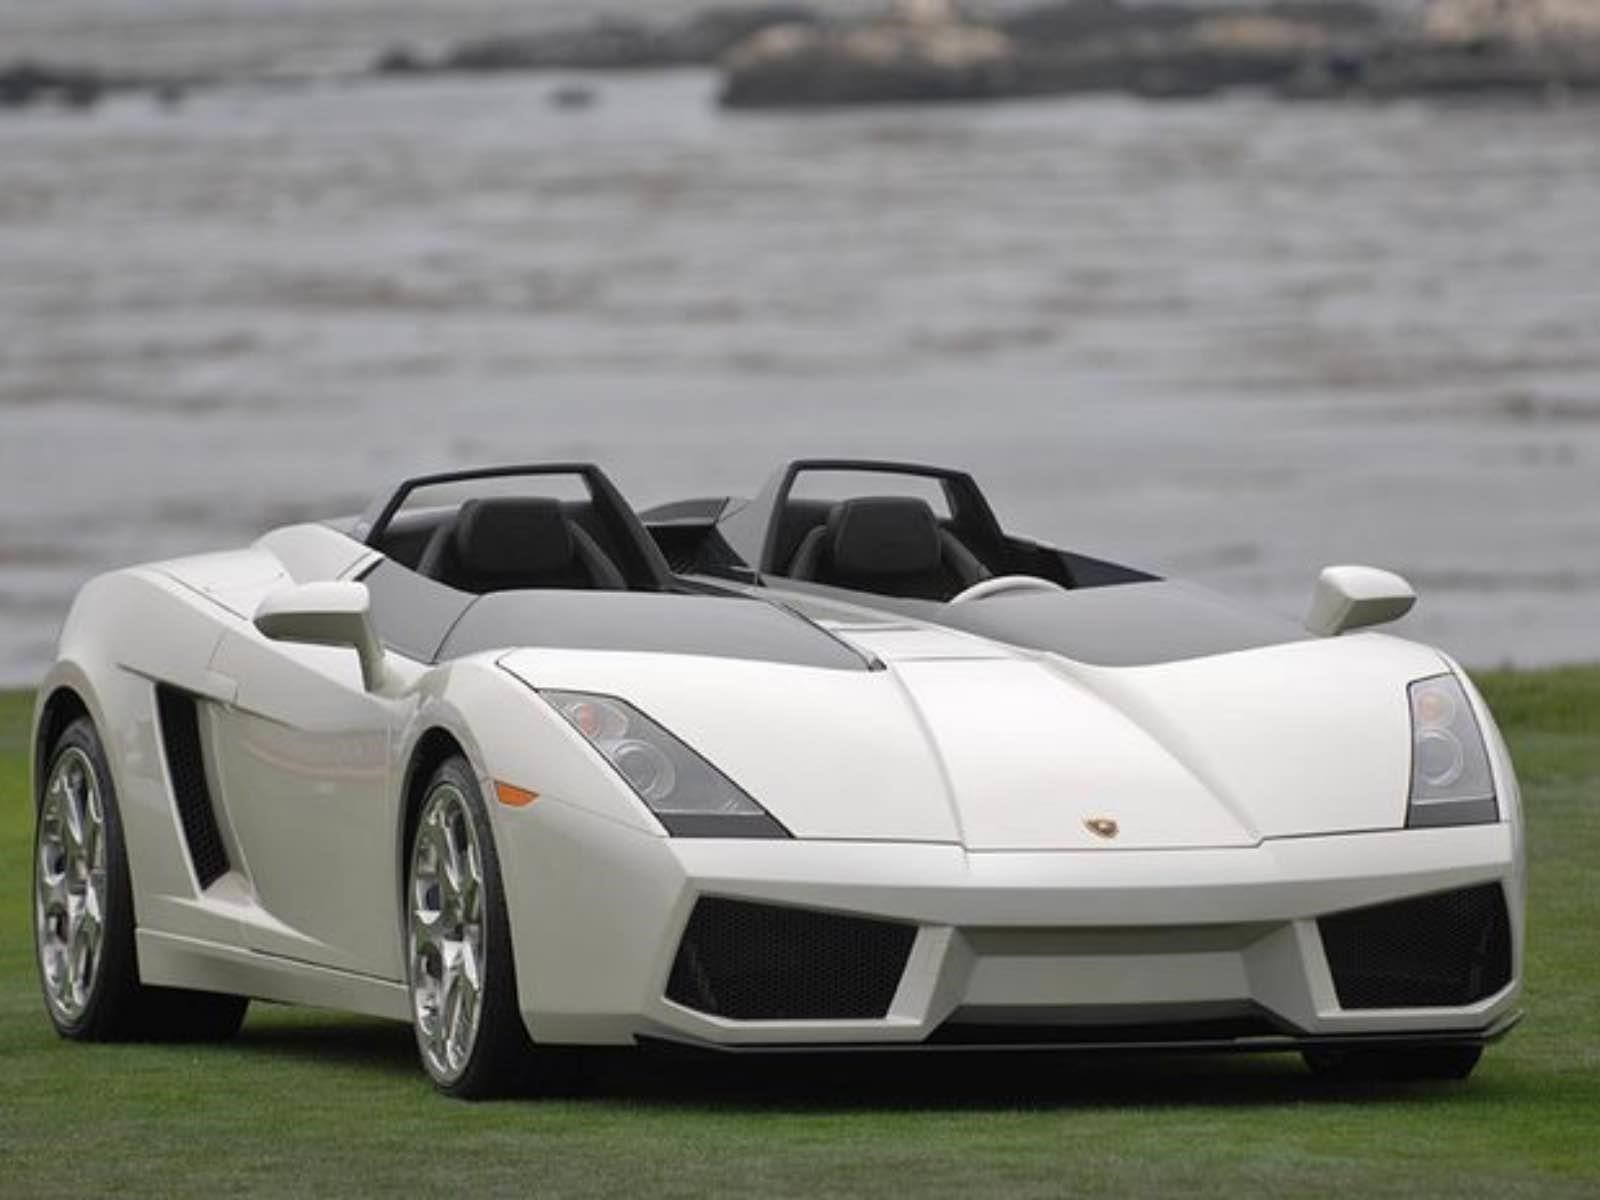 Lamborghini Concept S se pone a la venta en Monterey